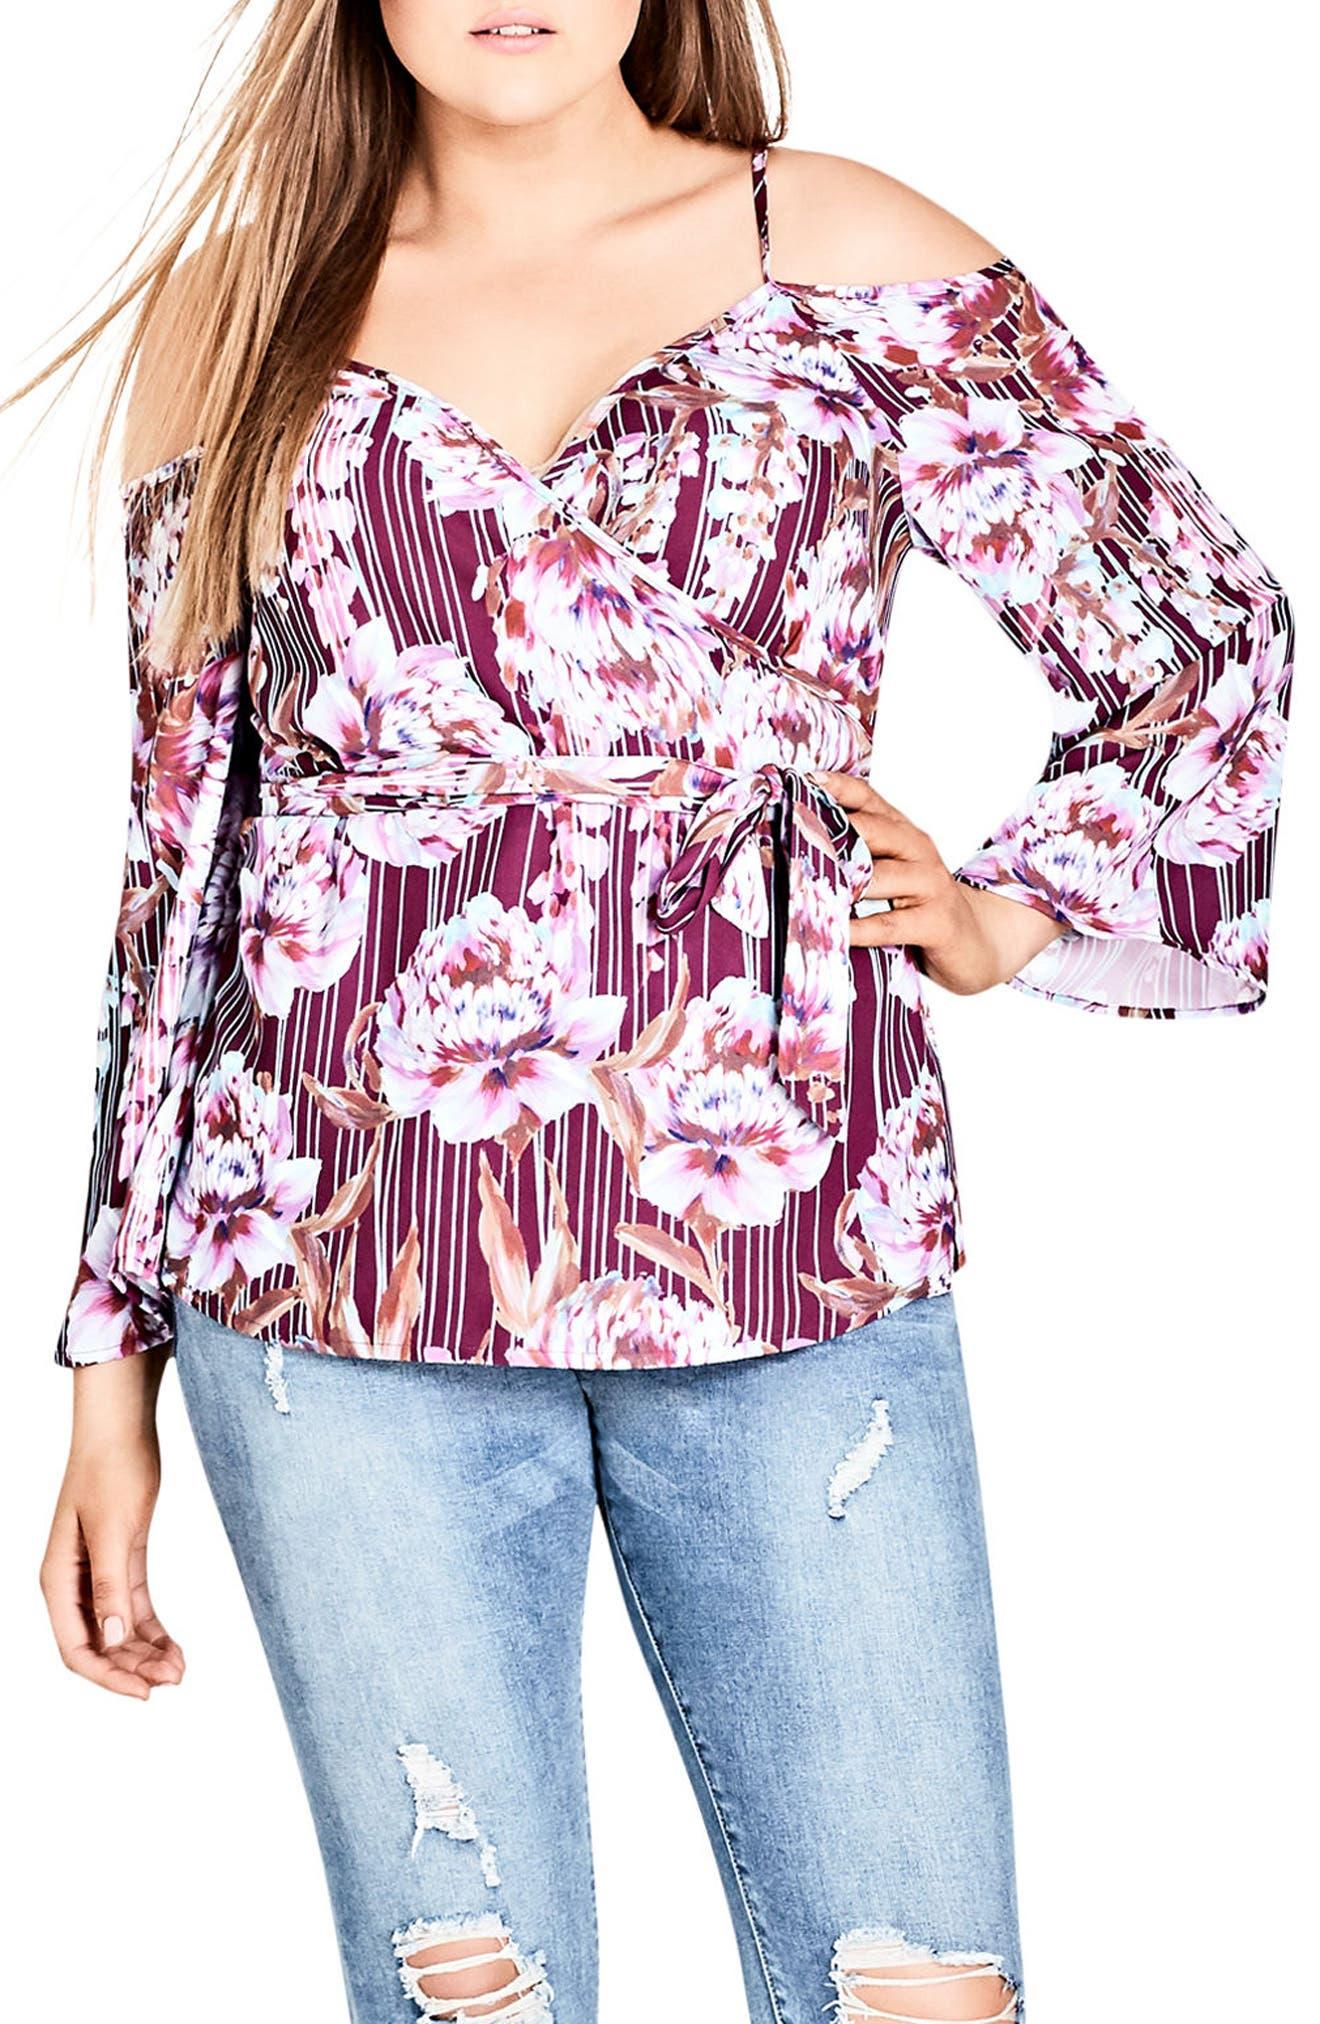 Alternate Image 1 Selected - City Chic Arthouse Floral Tie Waist Cold Shoulder Top (Plus Size)